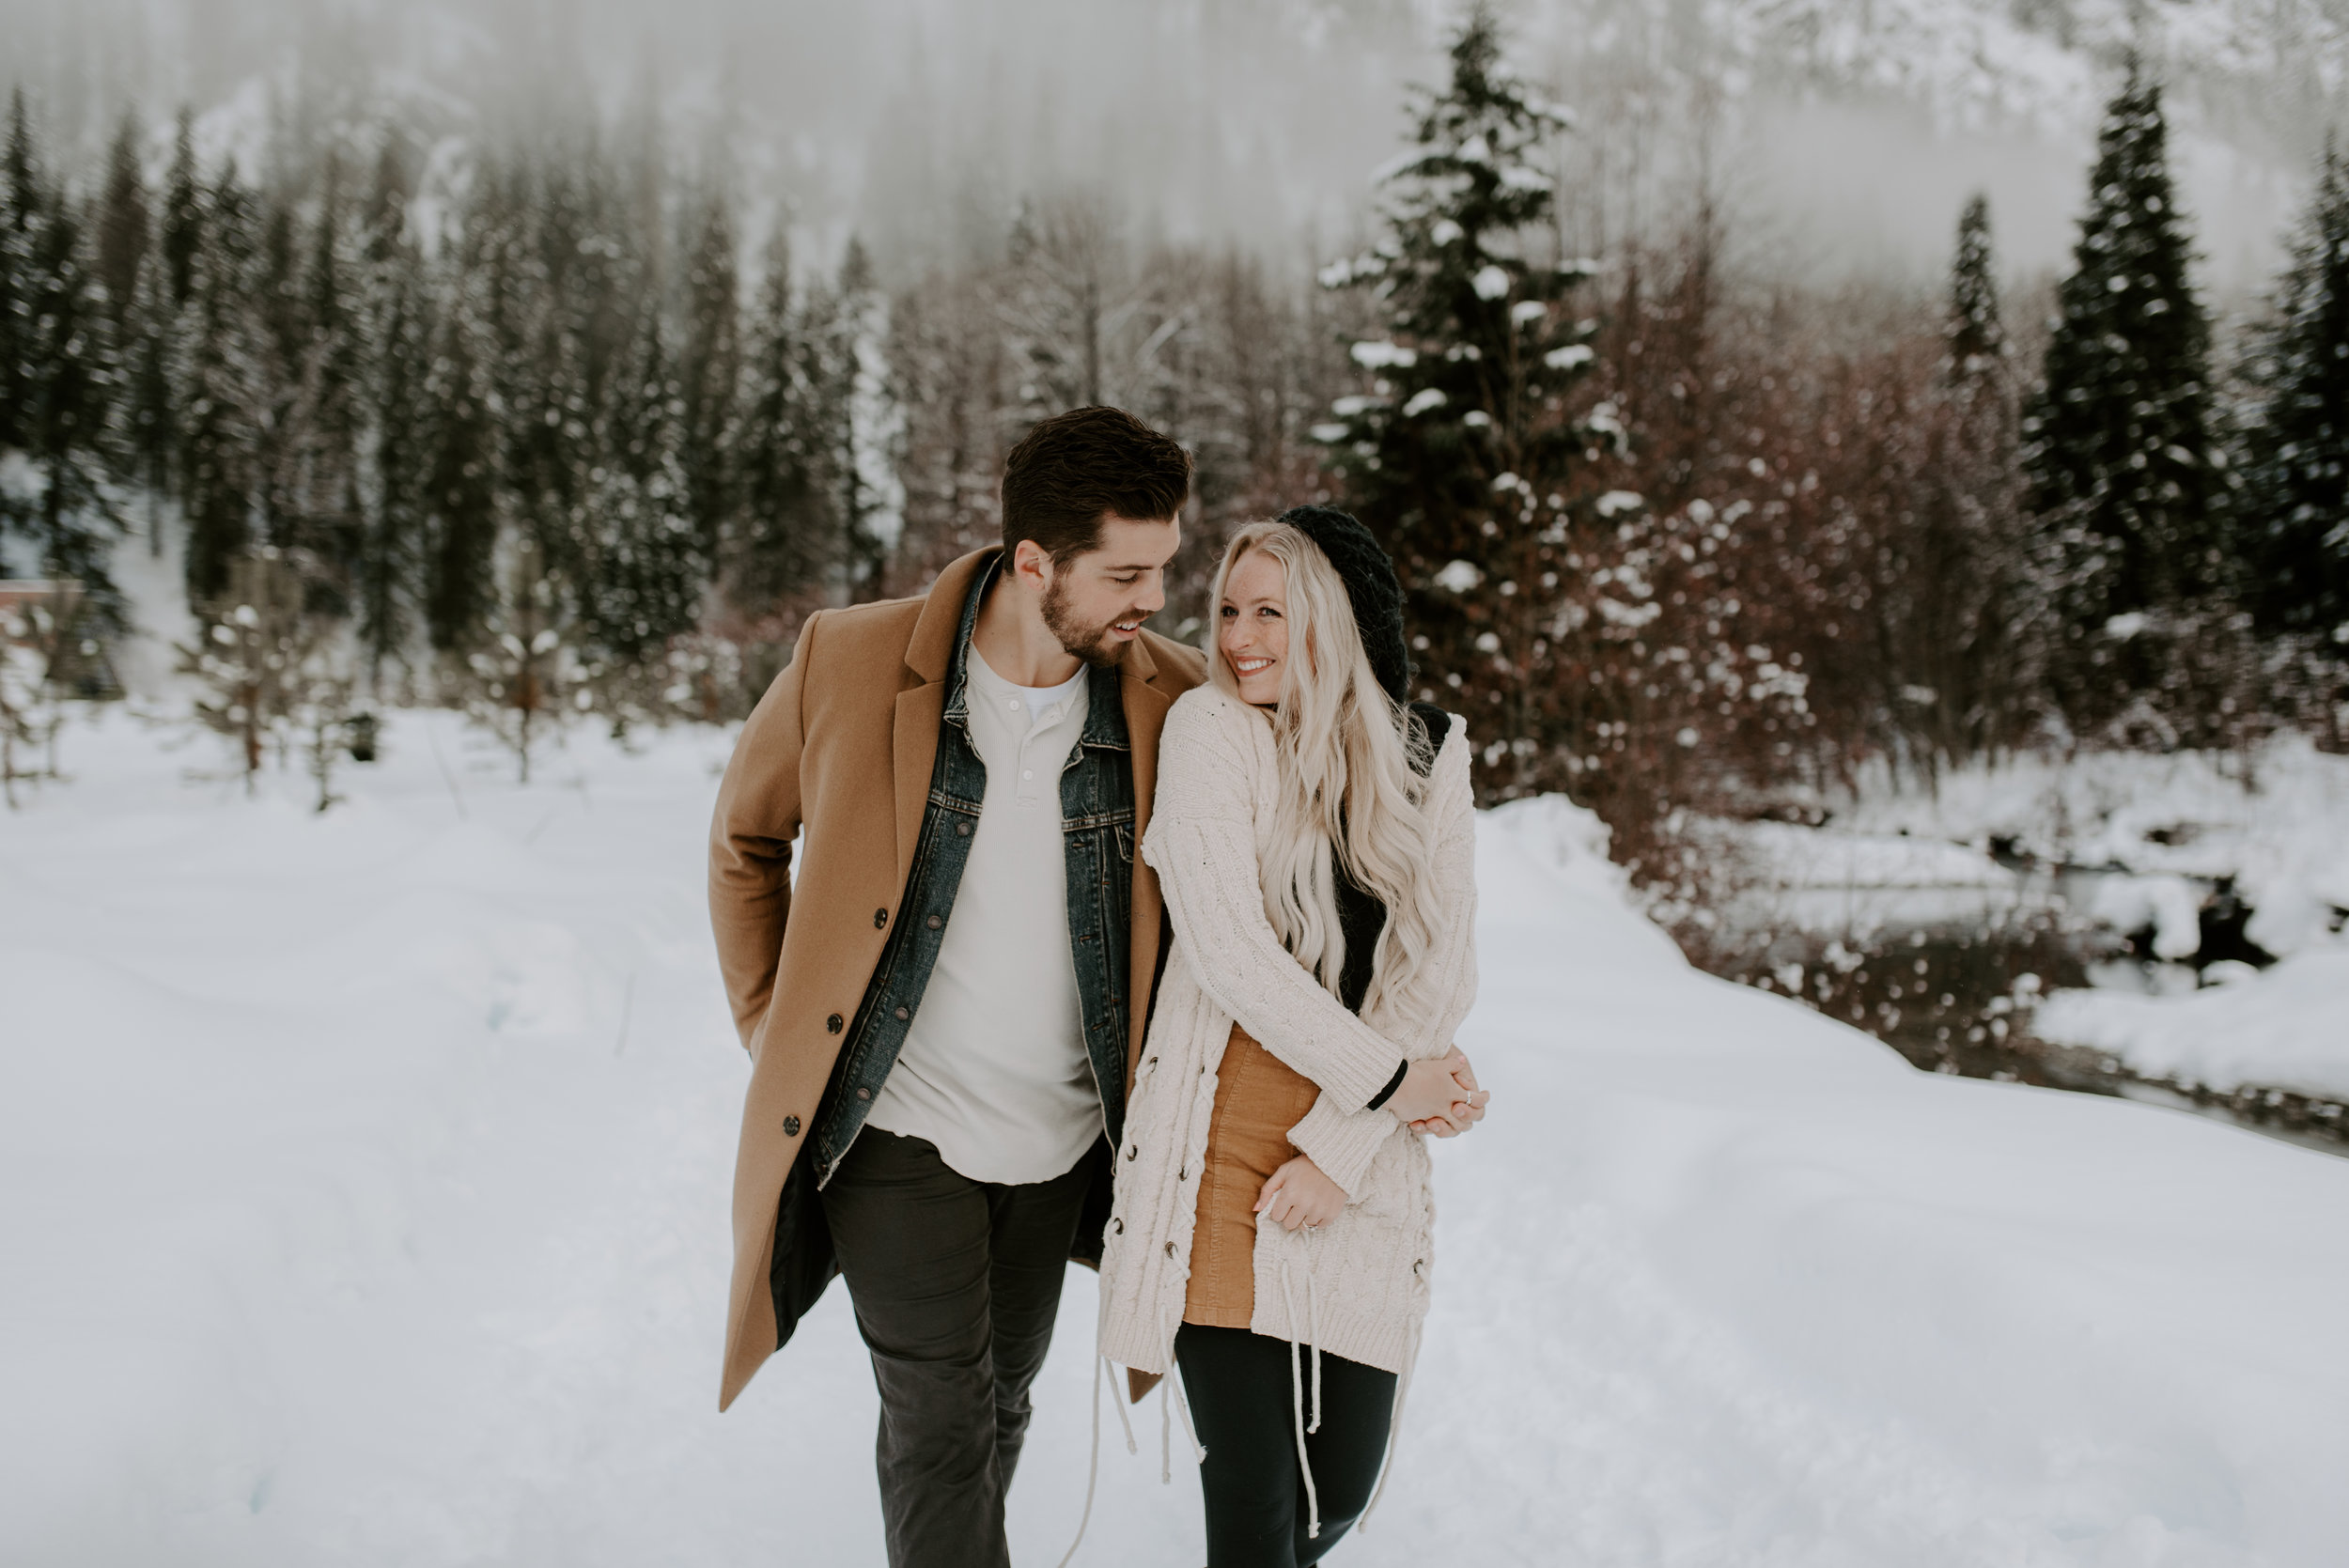 PNW elopement and wedding photographer for Washington and Oregon.